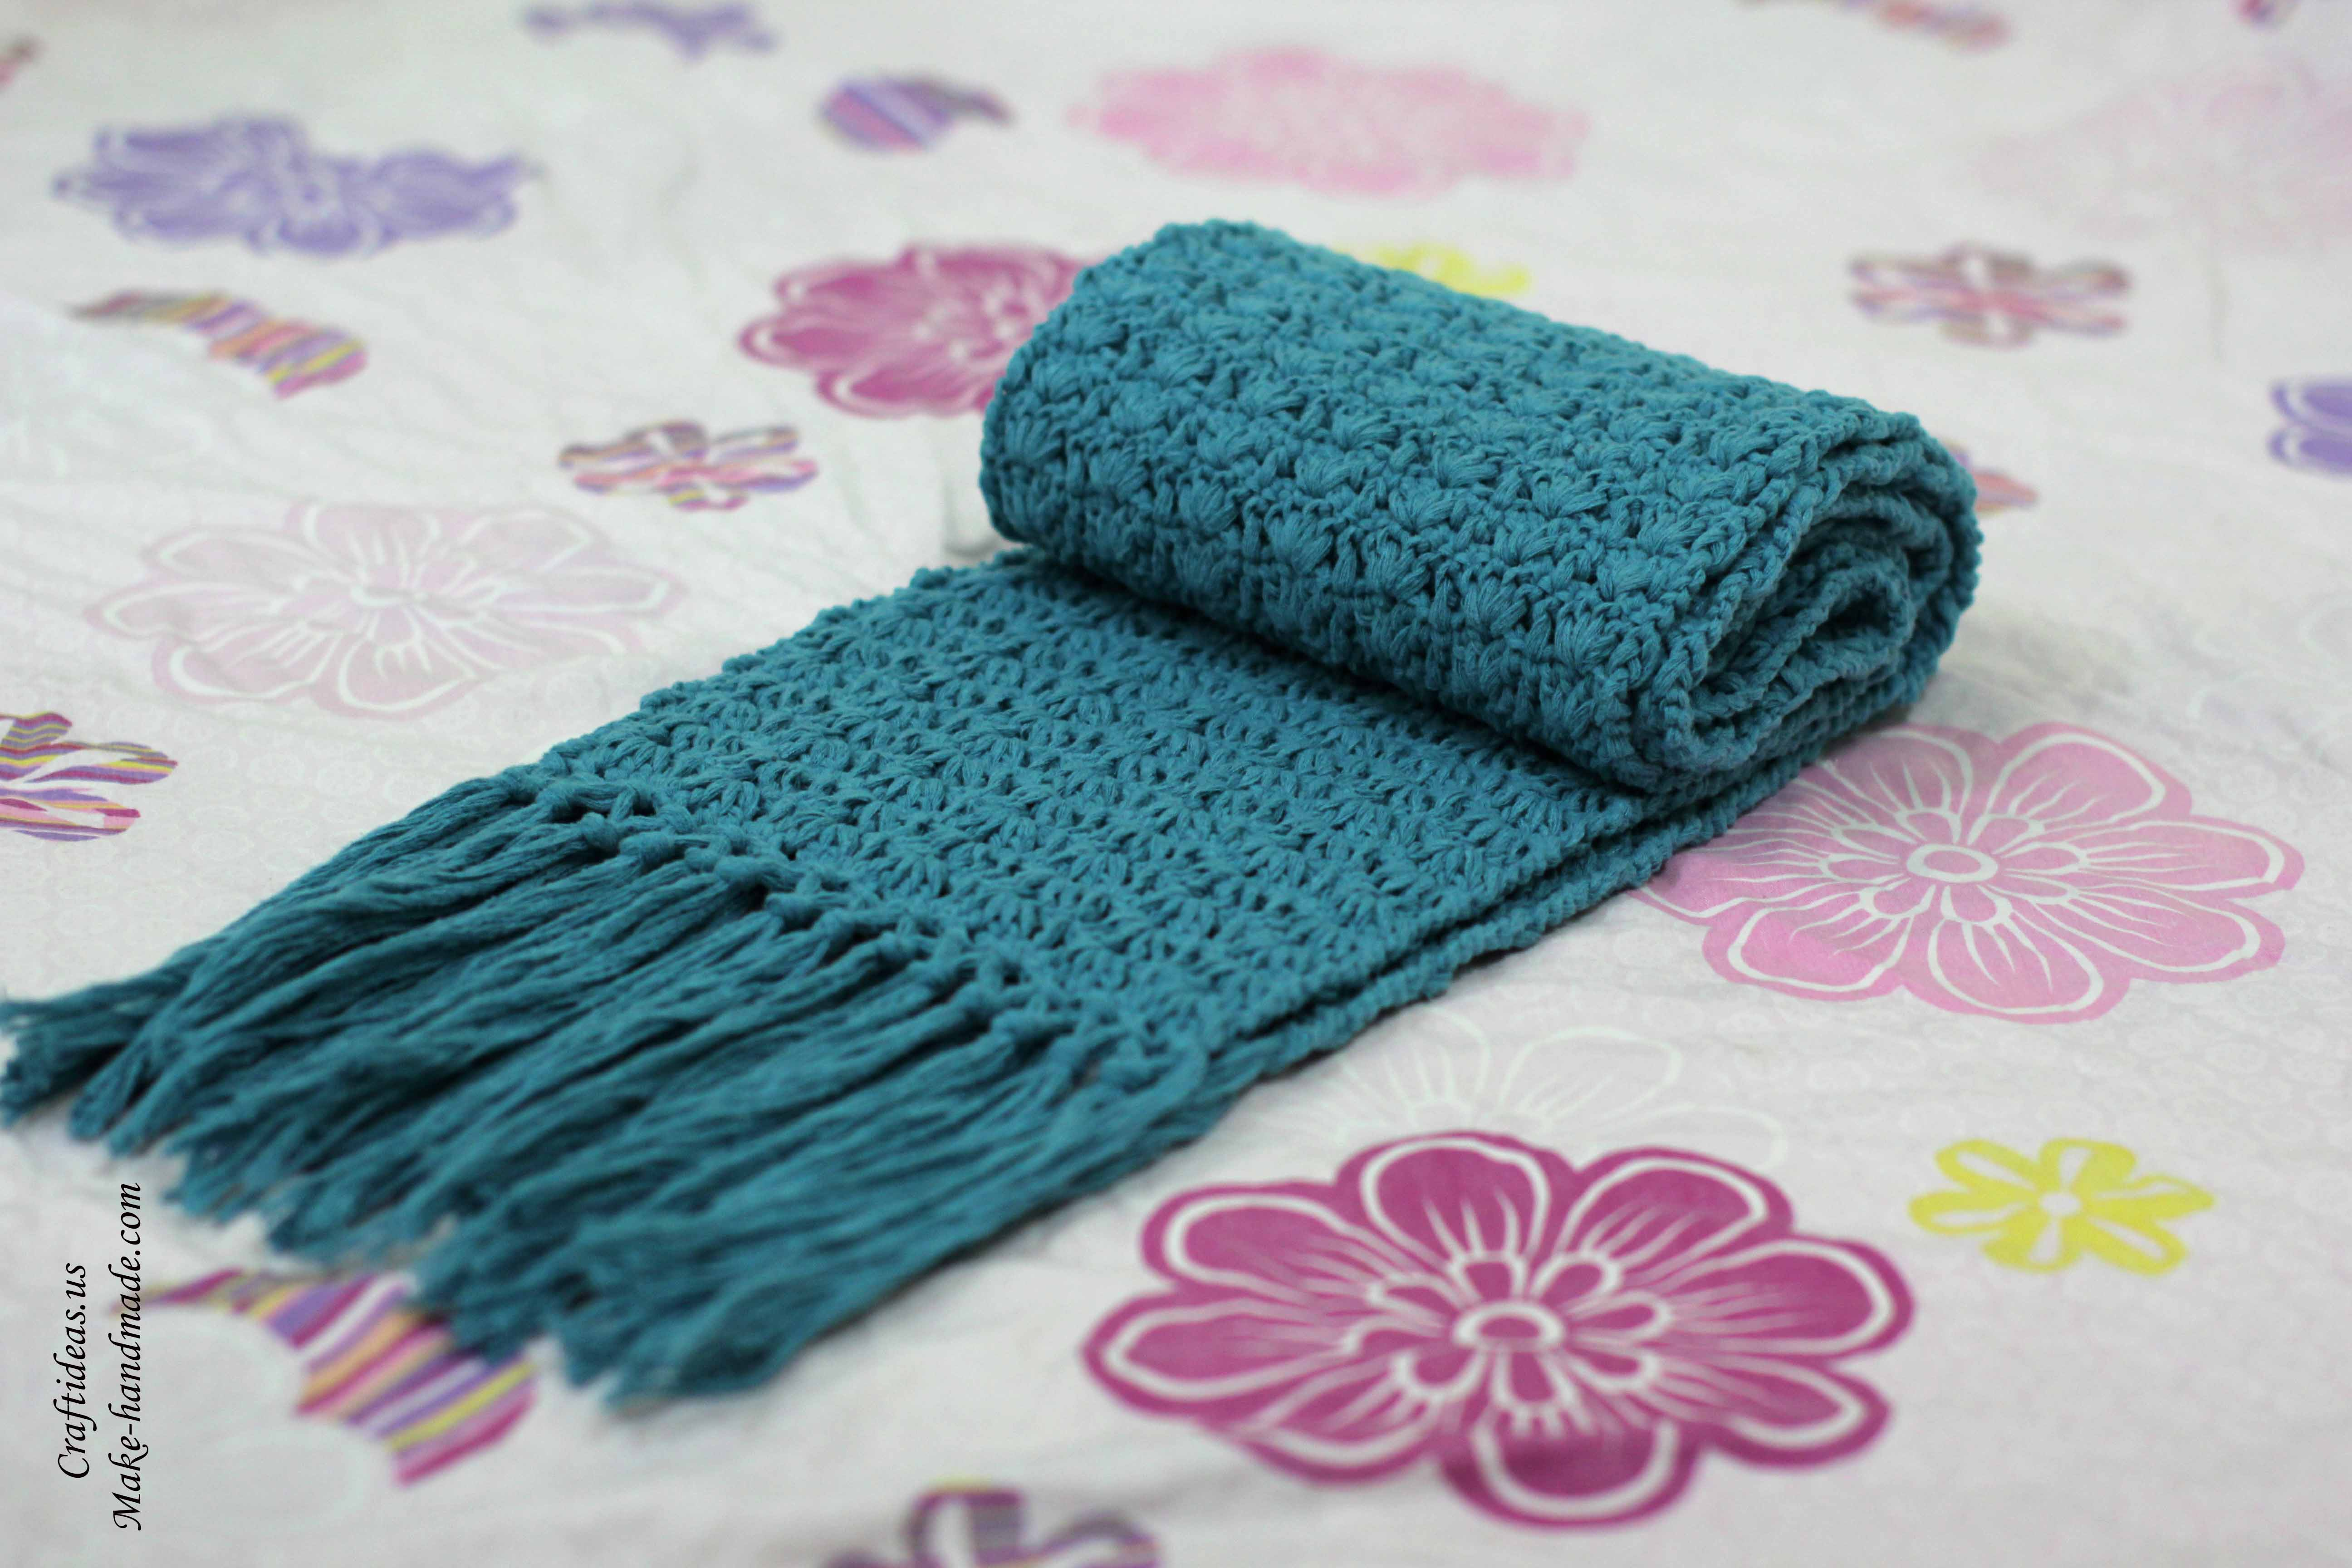 Crocheting Ideas : Crochet easy scarf idea - Craft Ideas